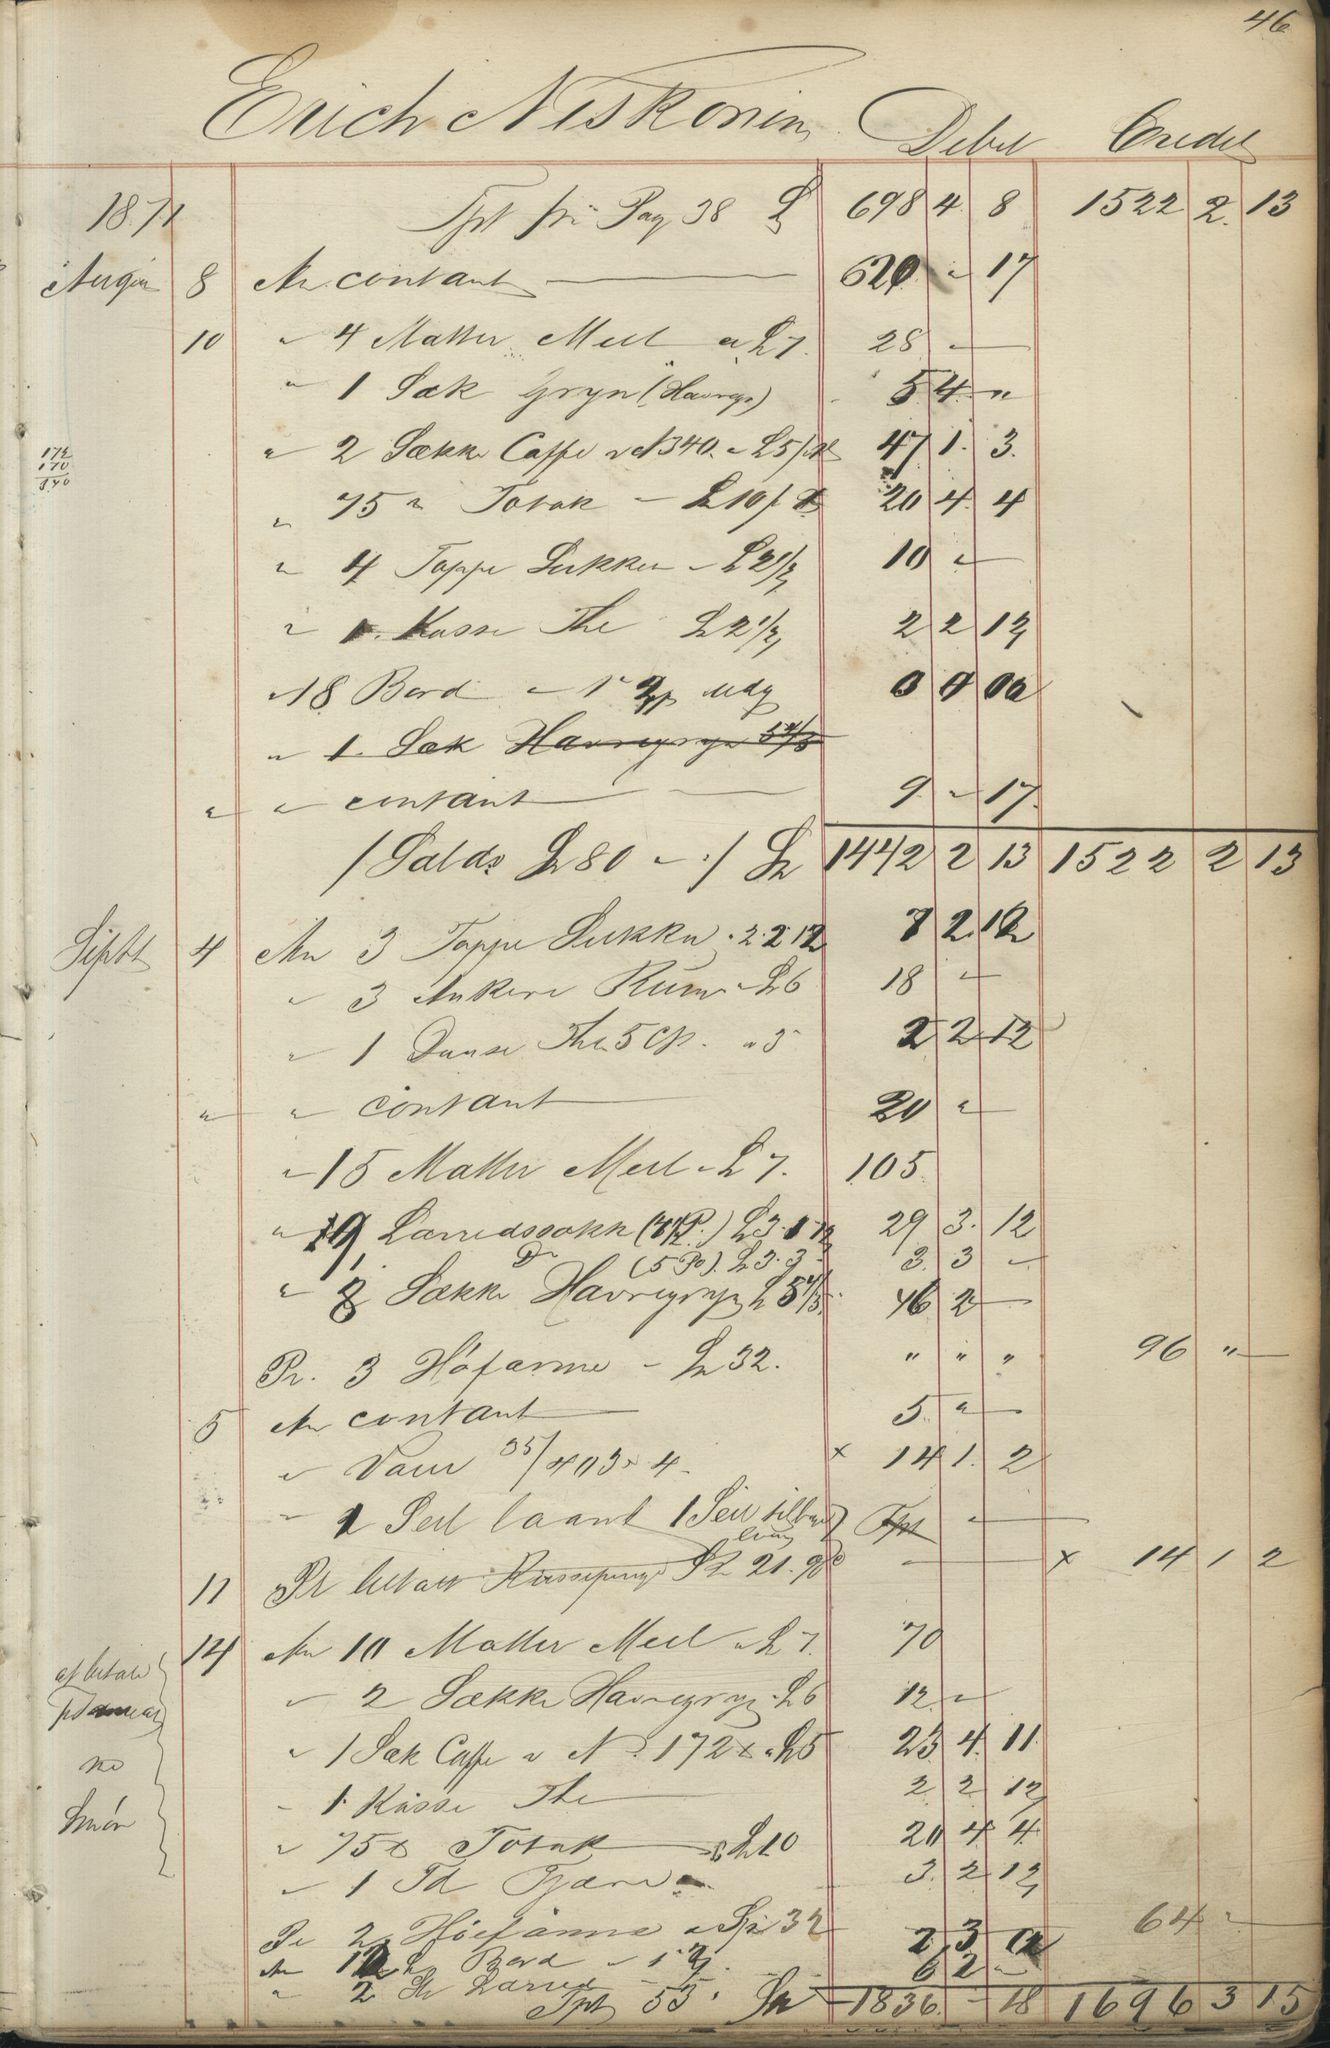 VAMU, Brodtkorb handel A/S, F/Fc/L0001: Konto for kvener og nordmenn på Kolahalvøya , 1868-1894